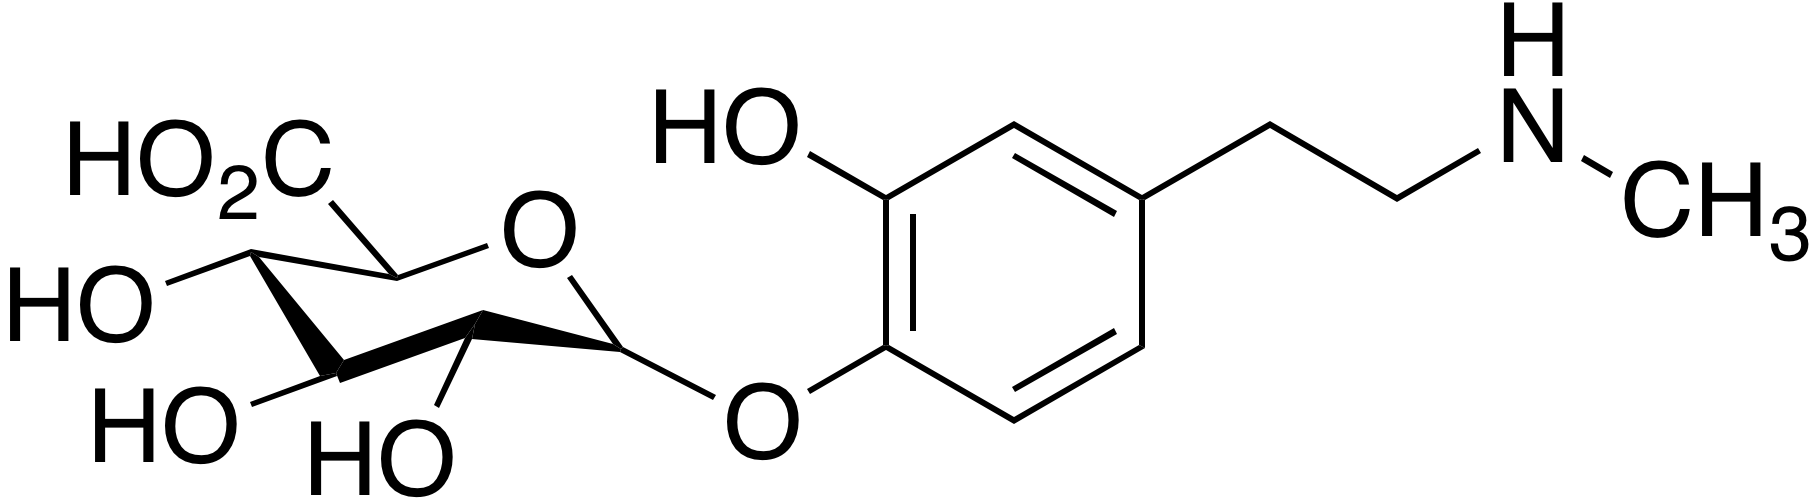 4-O-Glucuronylepinine